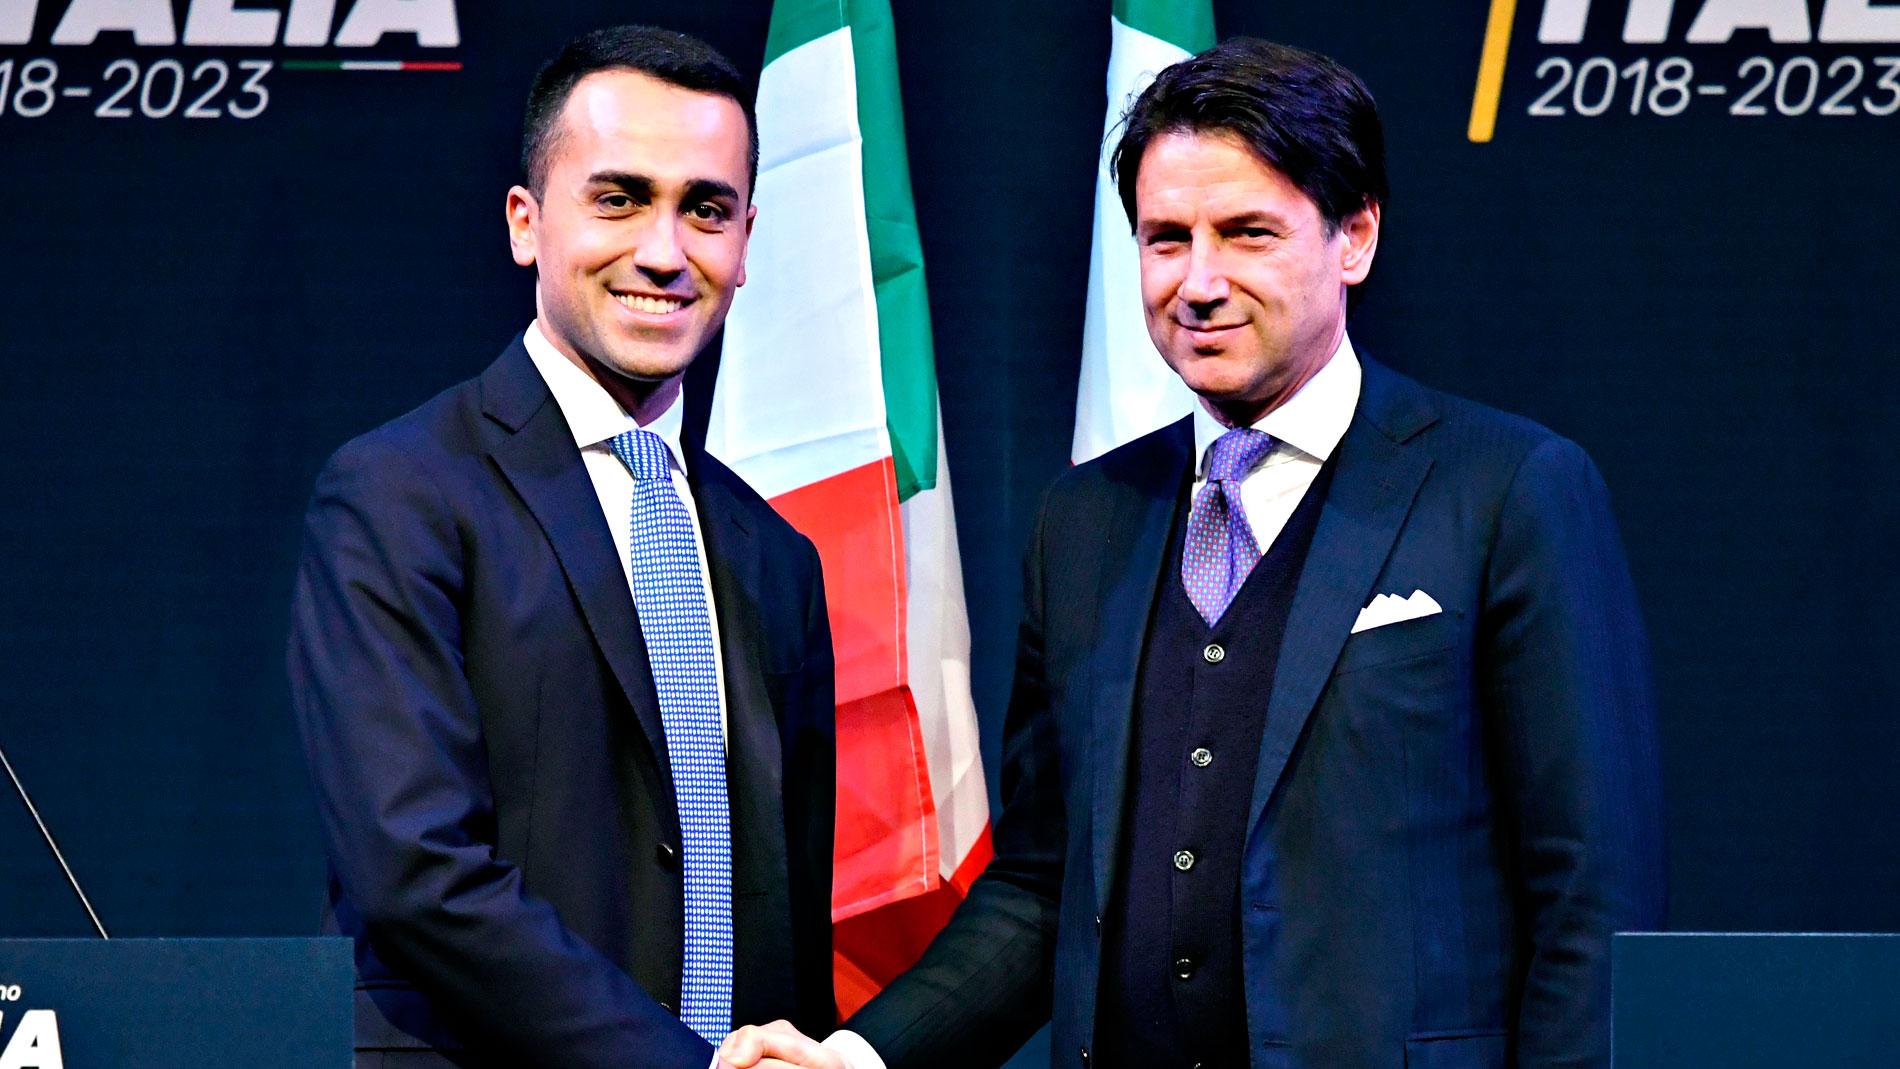 Italia primer ministro - El M5S y la Liga proponen a Giuseppe Conte ...